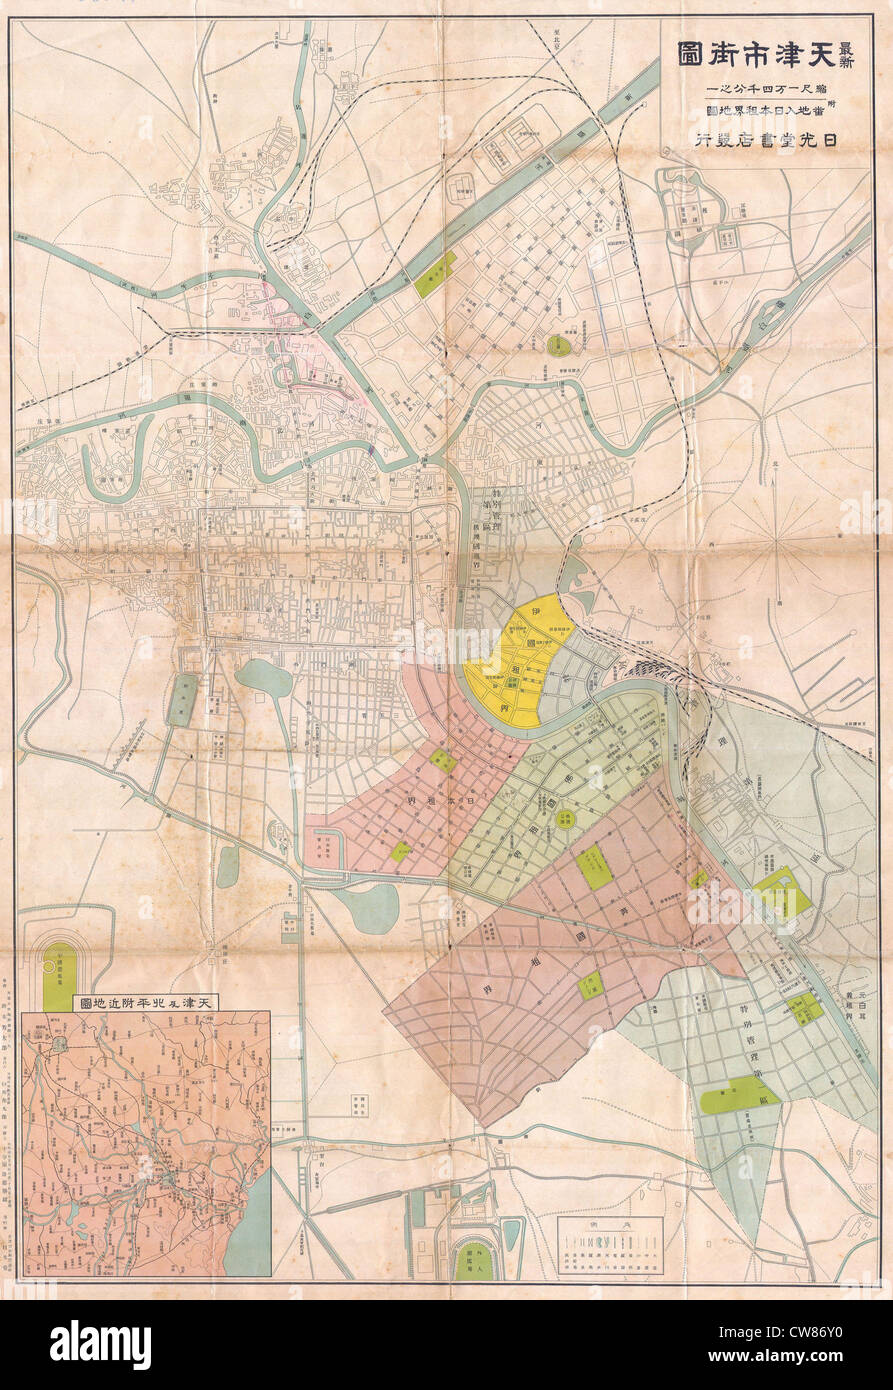 1930 Nikkodo Mappa di Tienjien ( Tientsin, Tianjin, Cina Immagini Stock